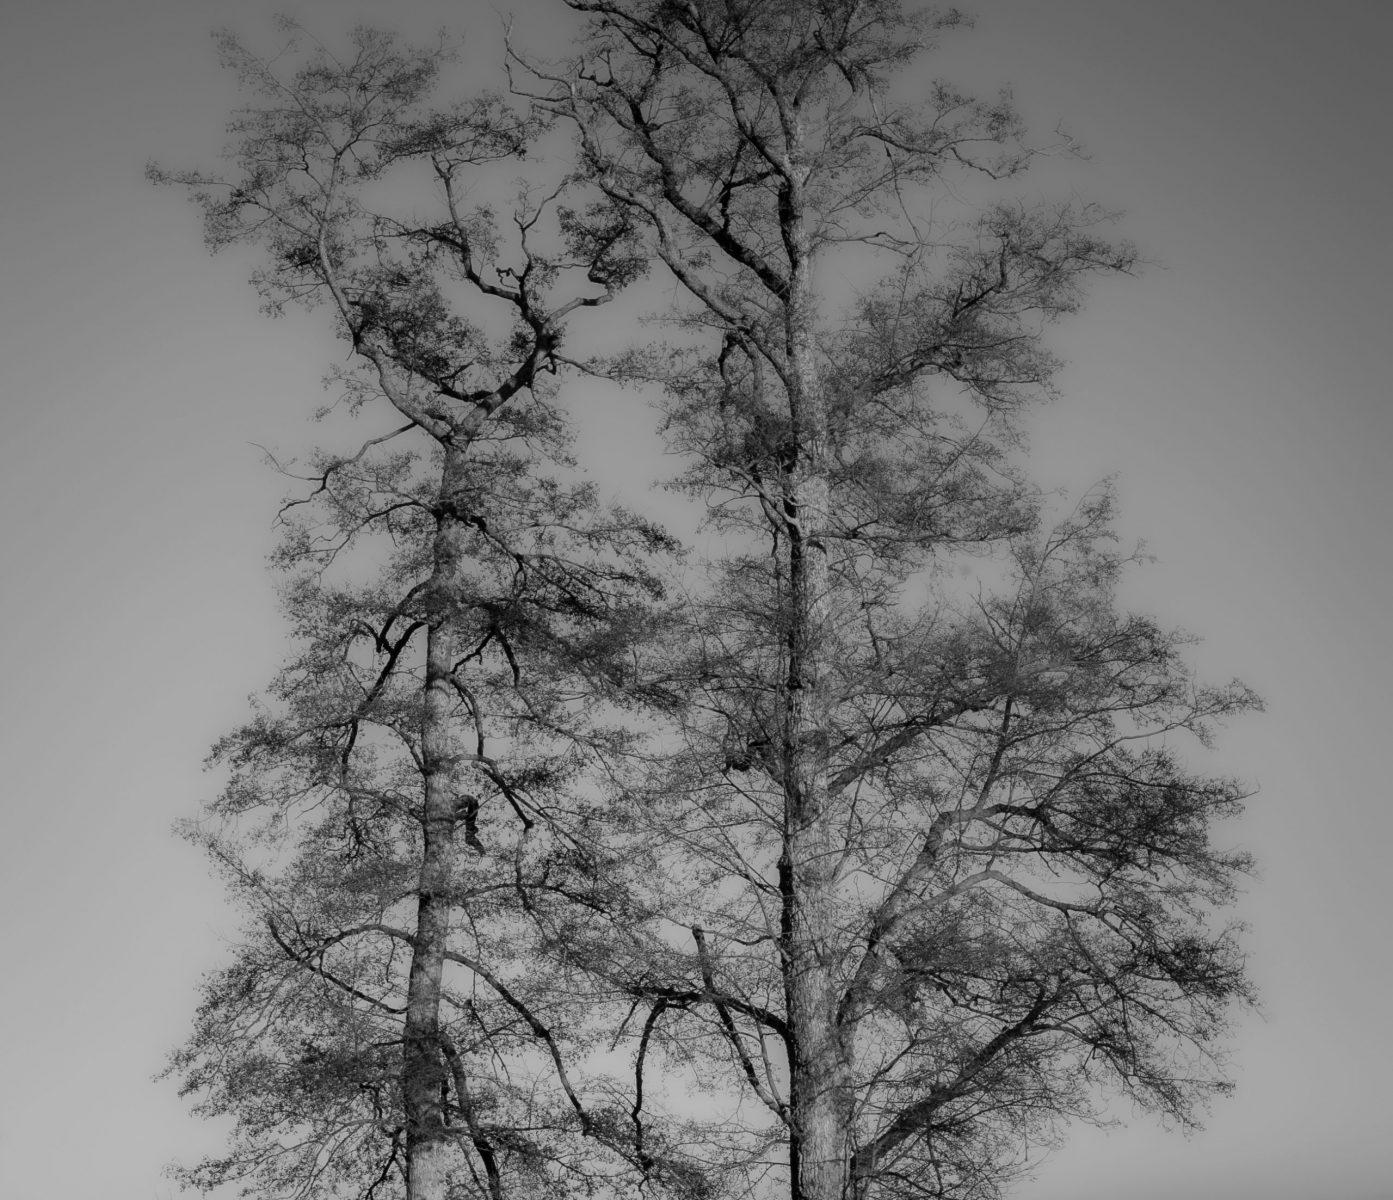 © Patrick Baltatzis